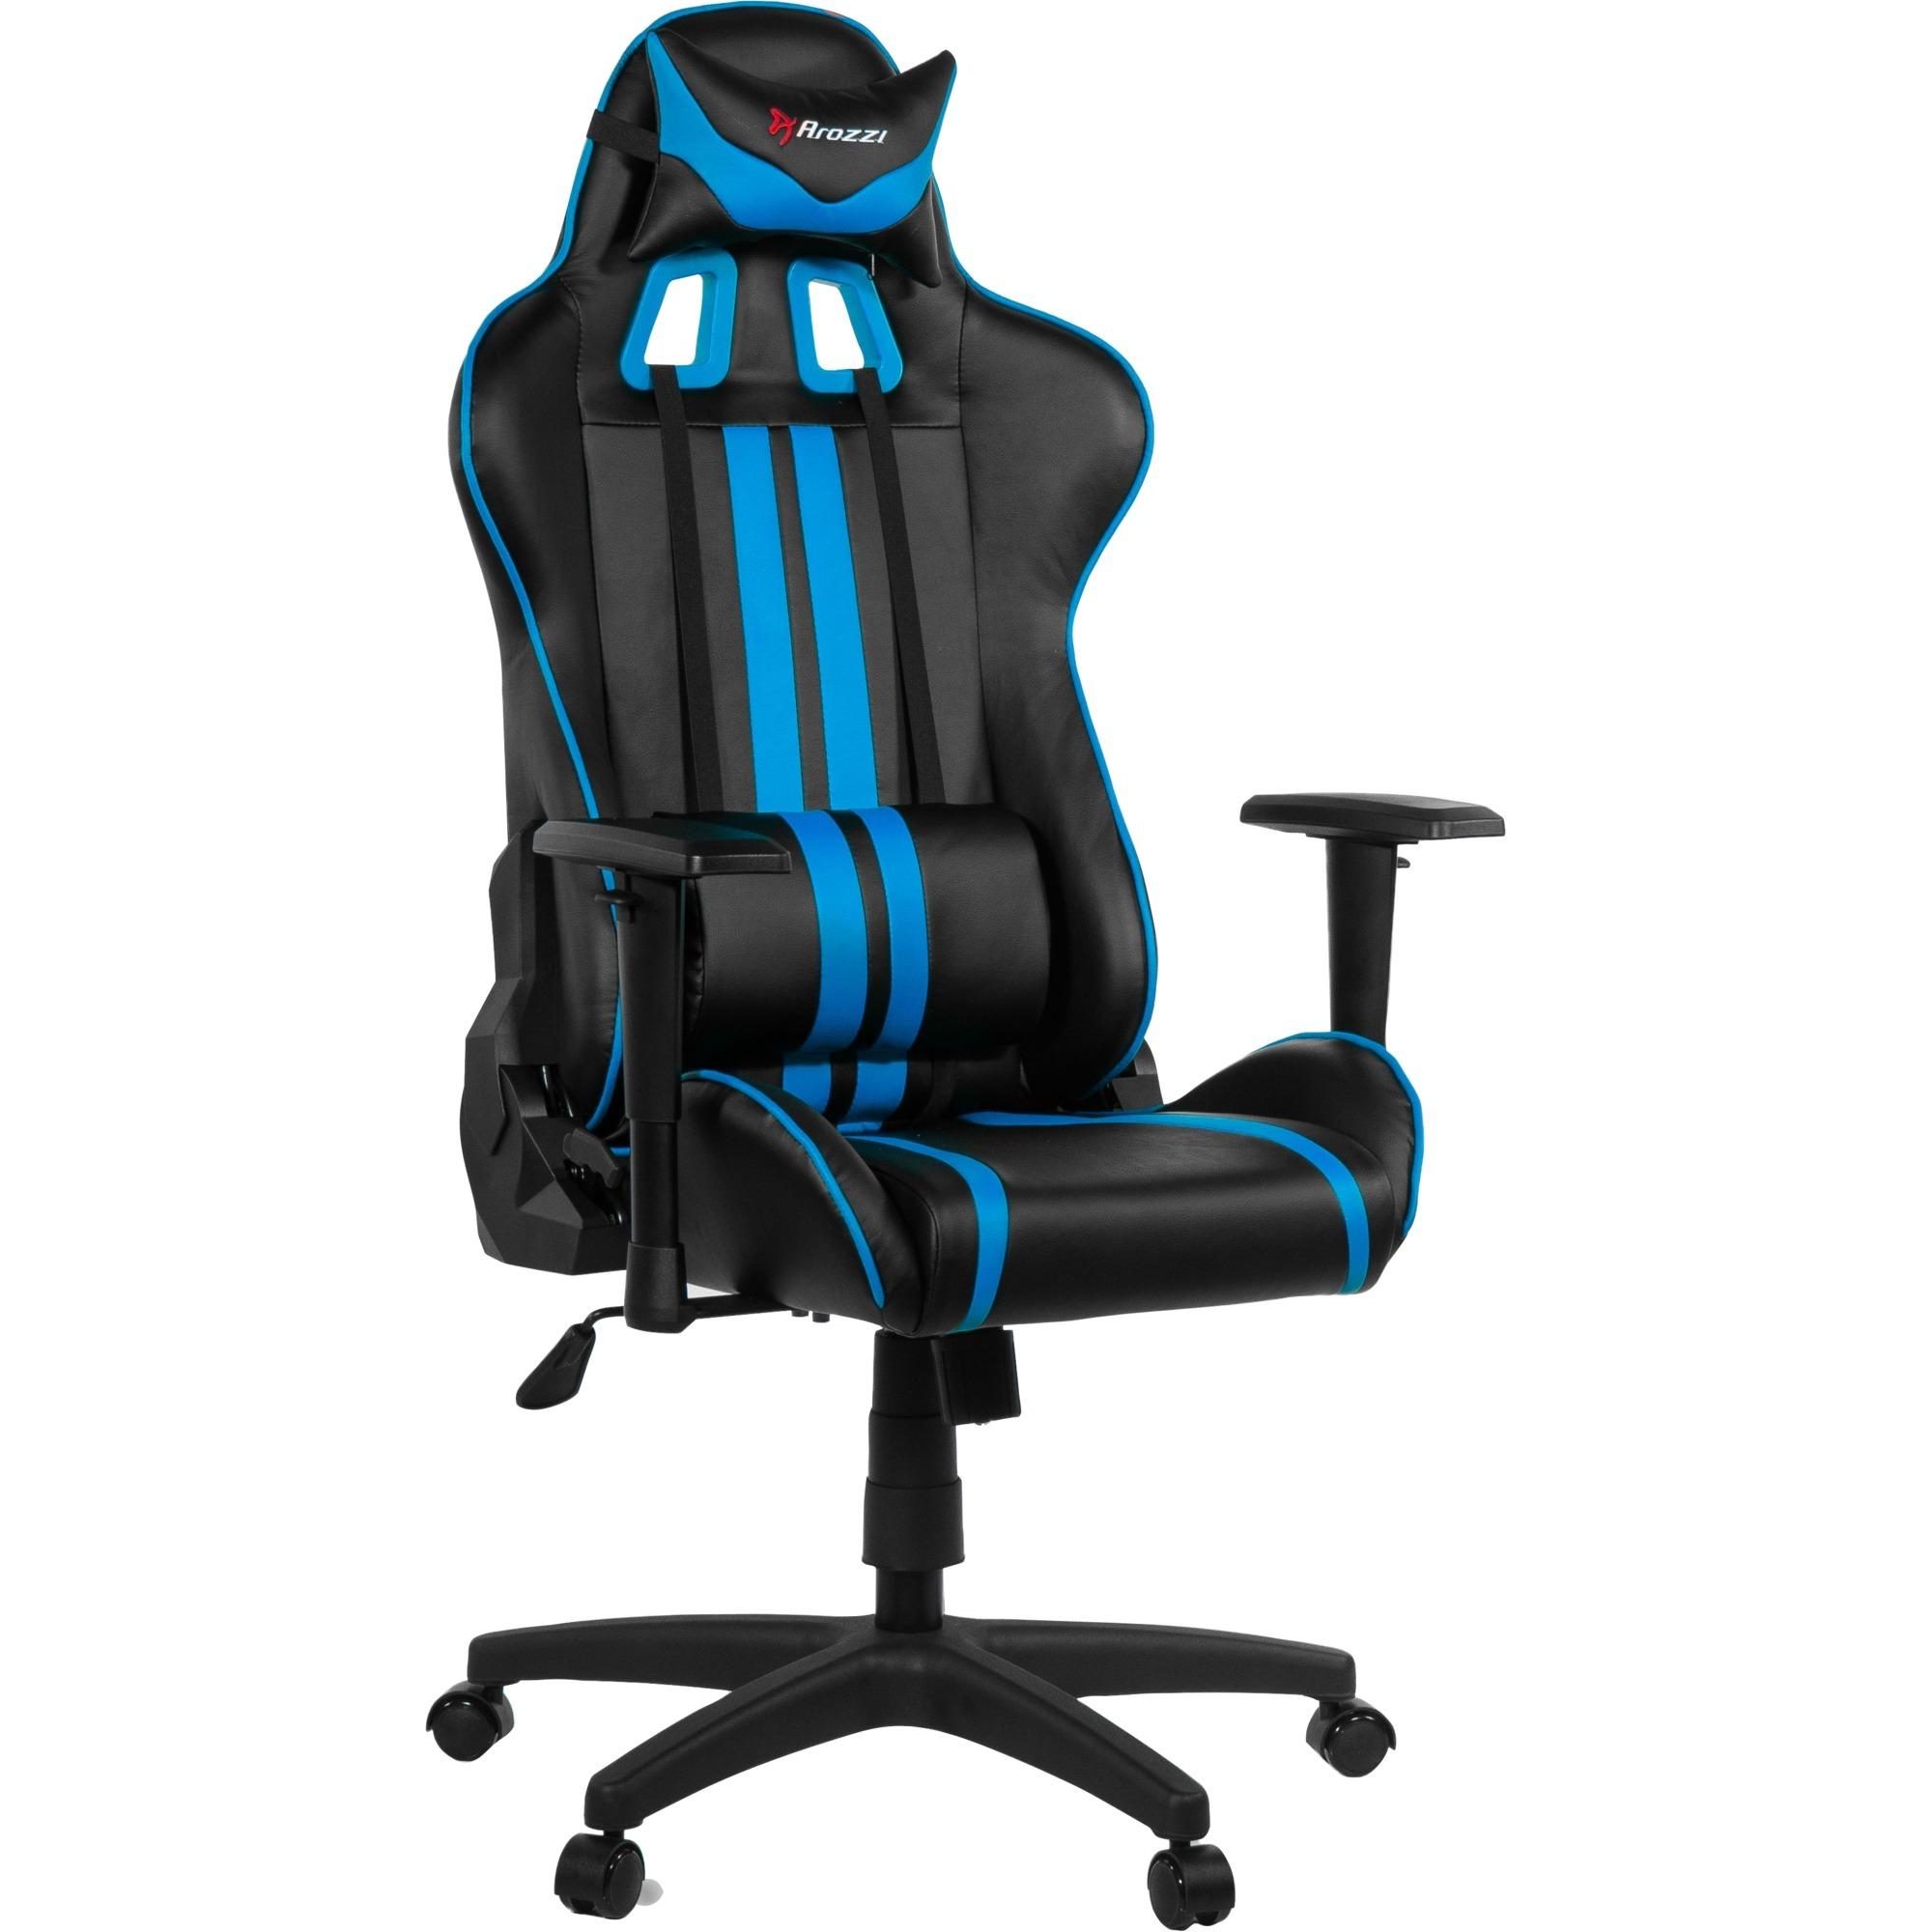 Arozzi Mezzo Gaming Chair, Siège de jeu